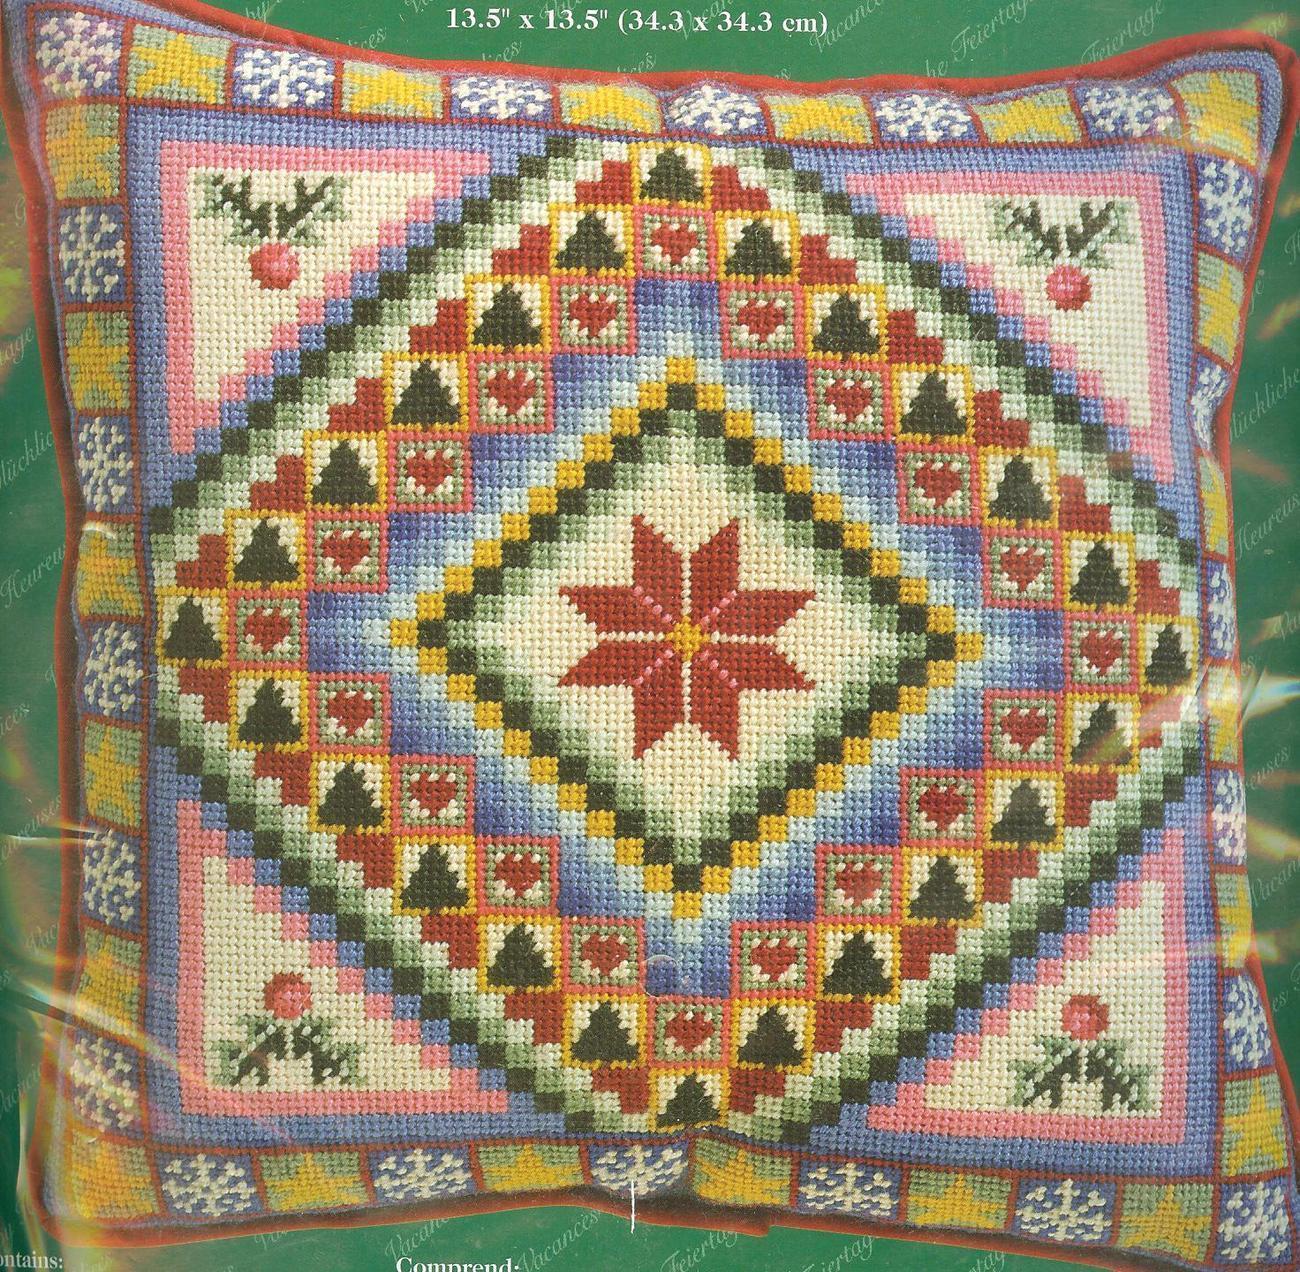 RARE~Janlynn~Christmas Patchwork Needlepoint Kit~NIP~Dated 2001 - $14.39